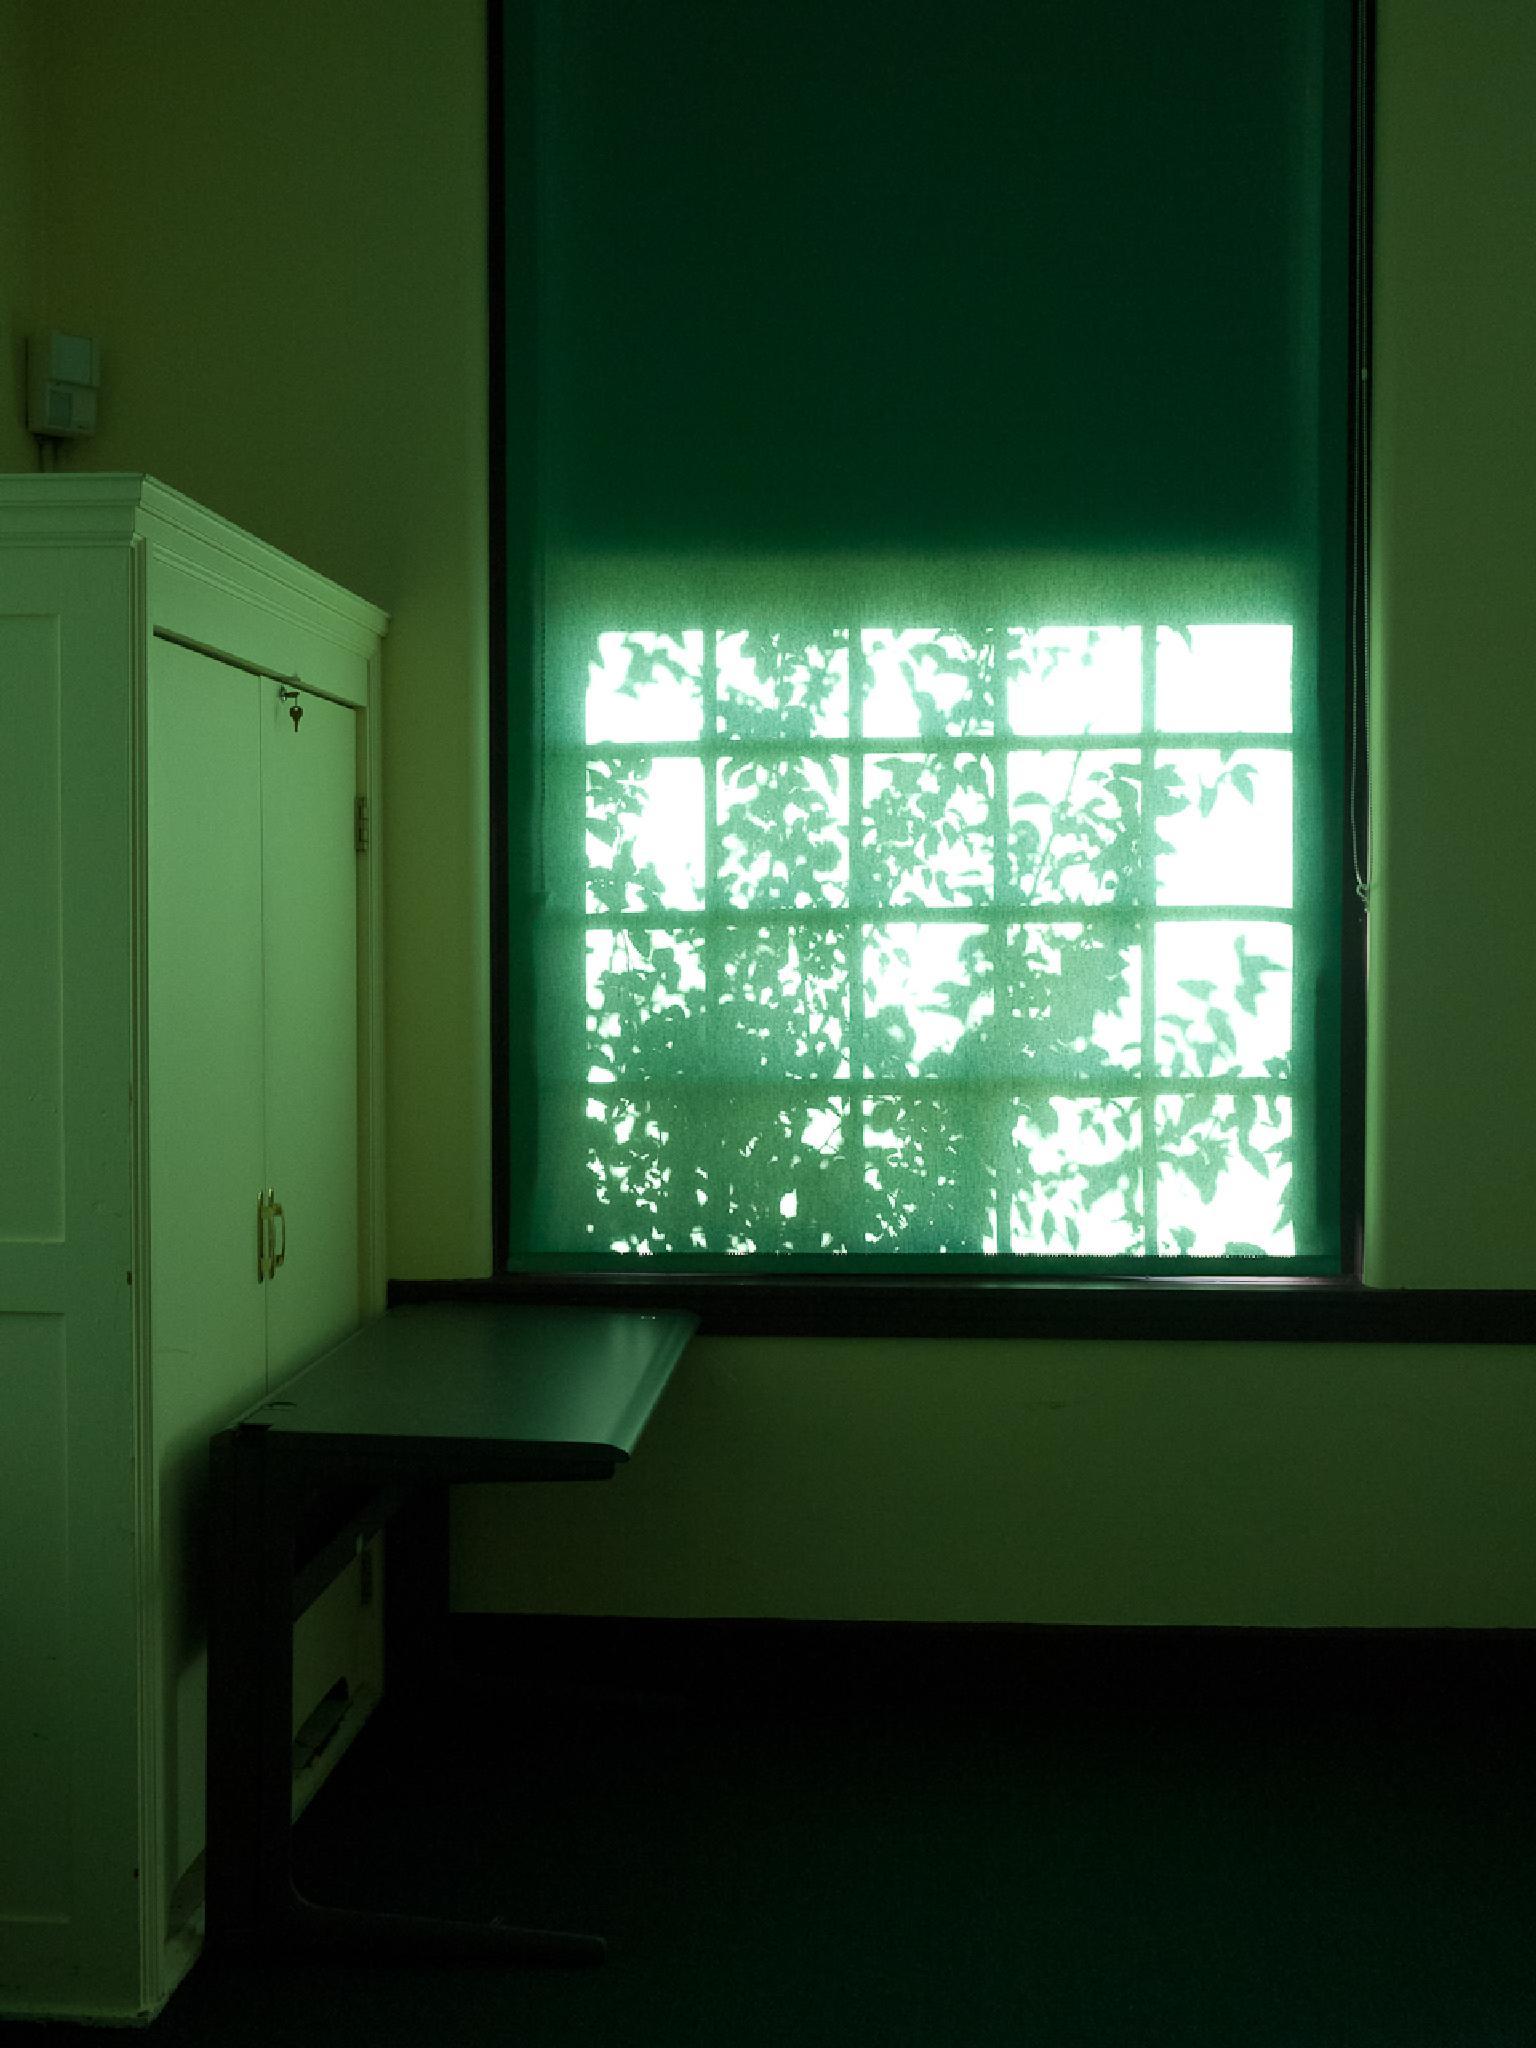 Green Room by Leann